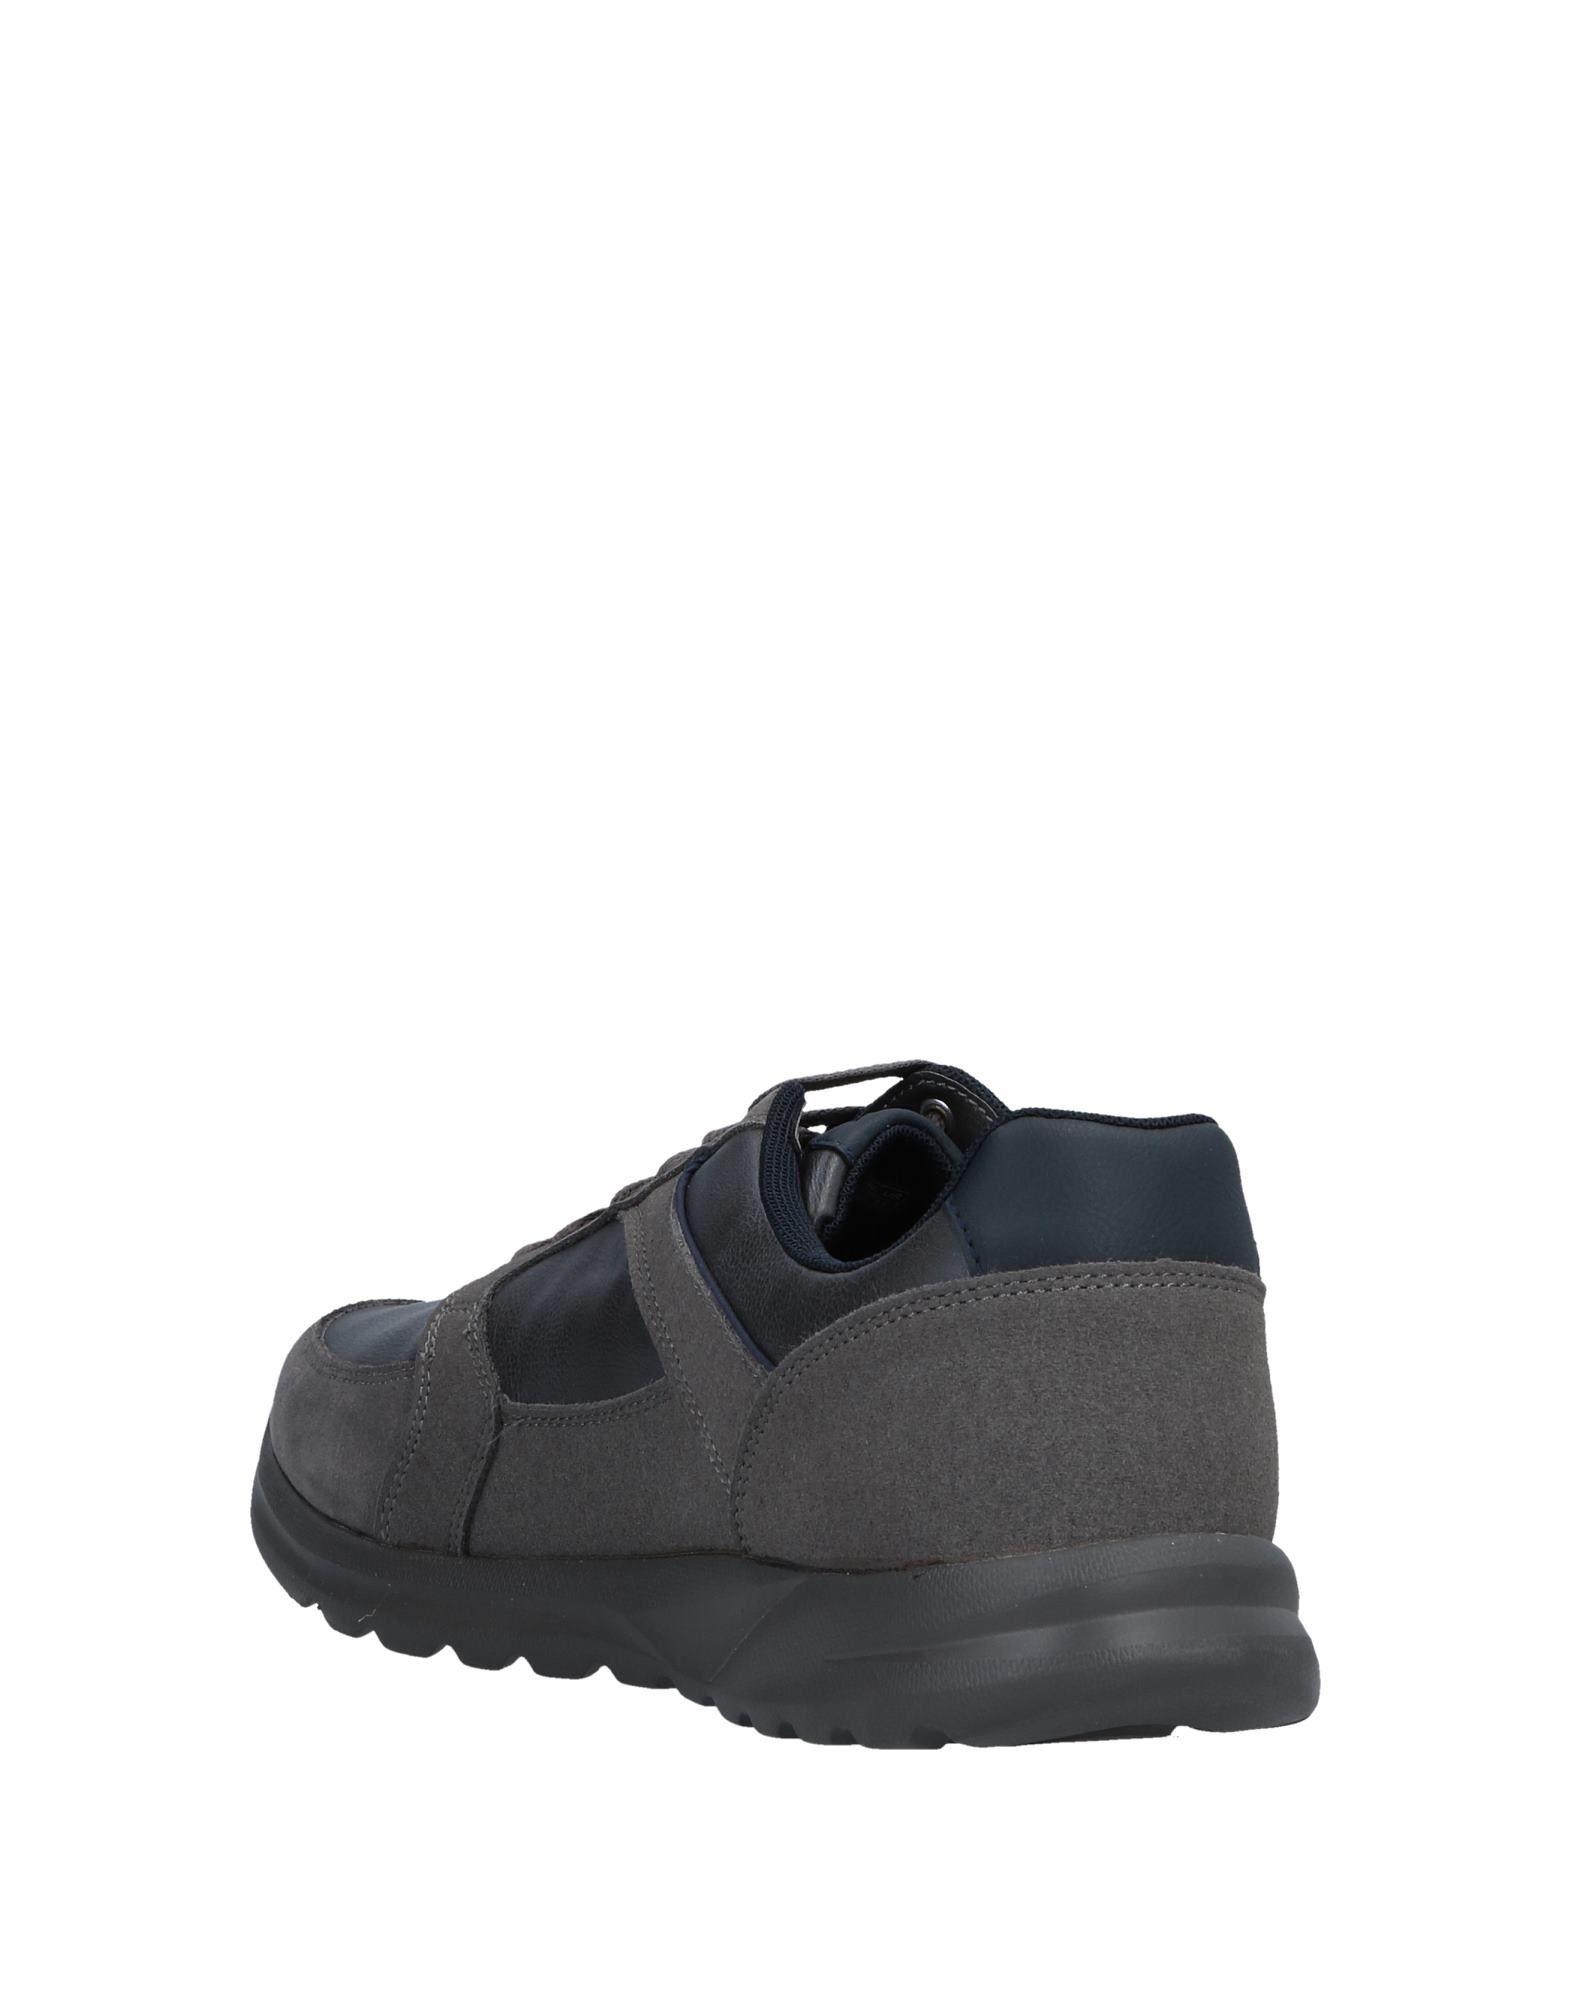 Geox Sneakers Herren  Heiße 11539509DX Heiße  Schuhe 68bfe9